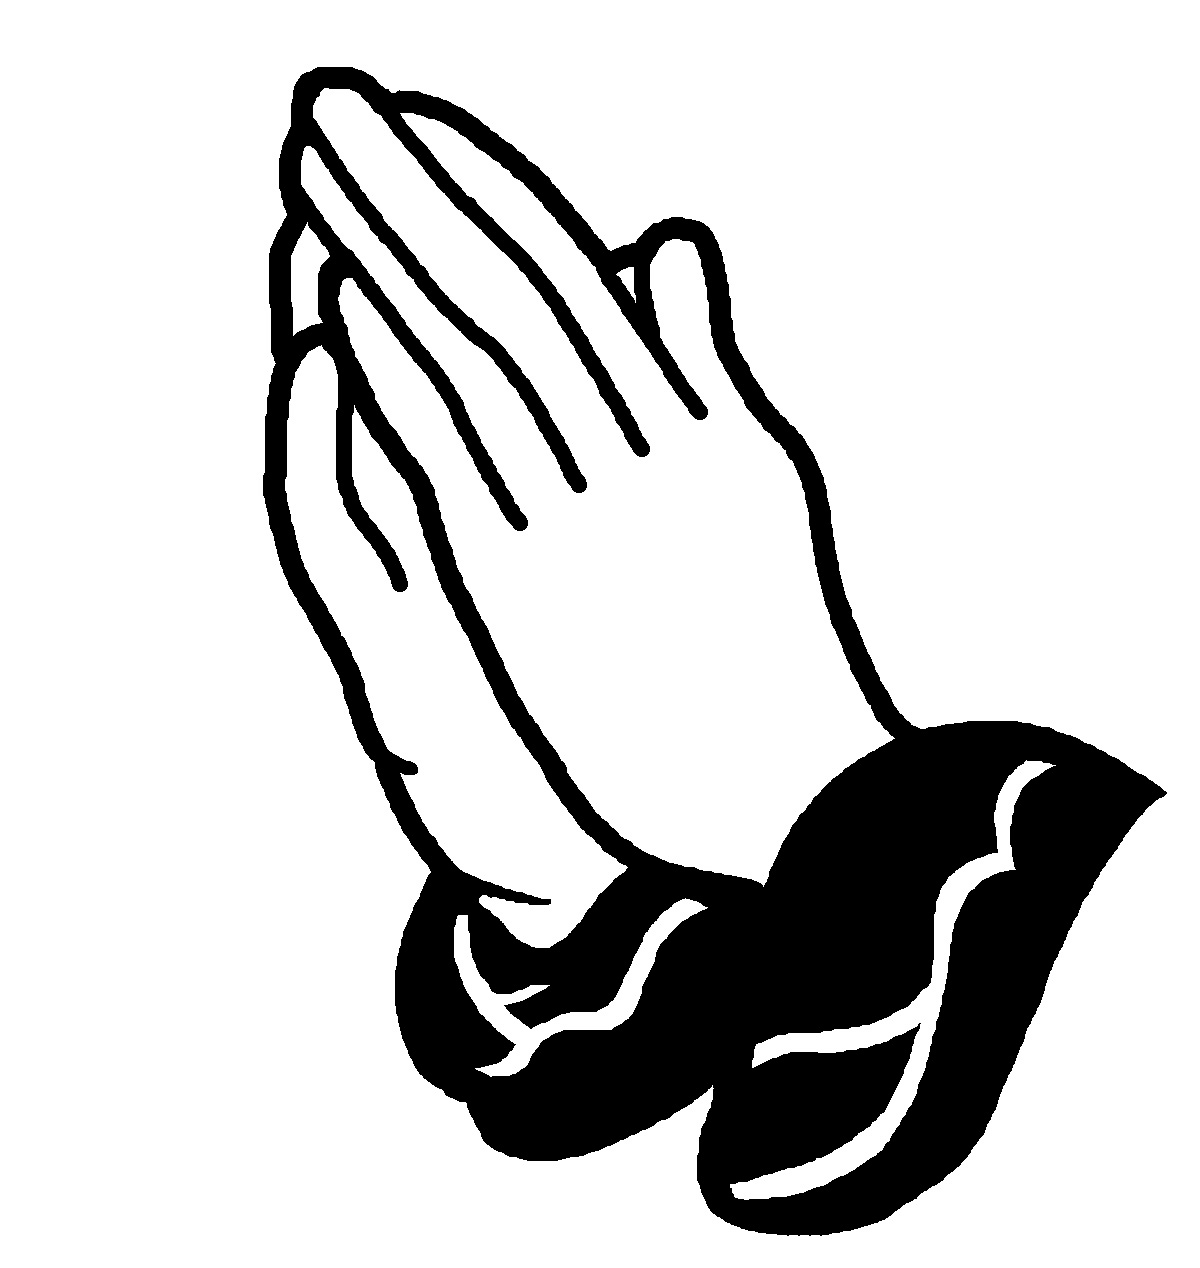 Pray Vector at GetDrawings.com   Free for personal use Pray Vector ...